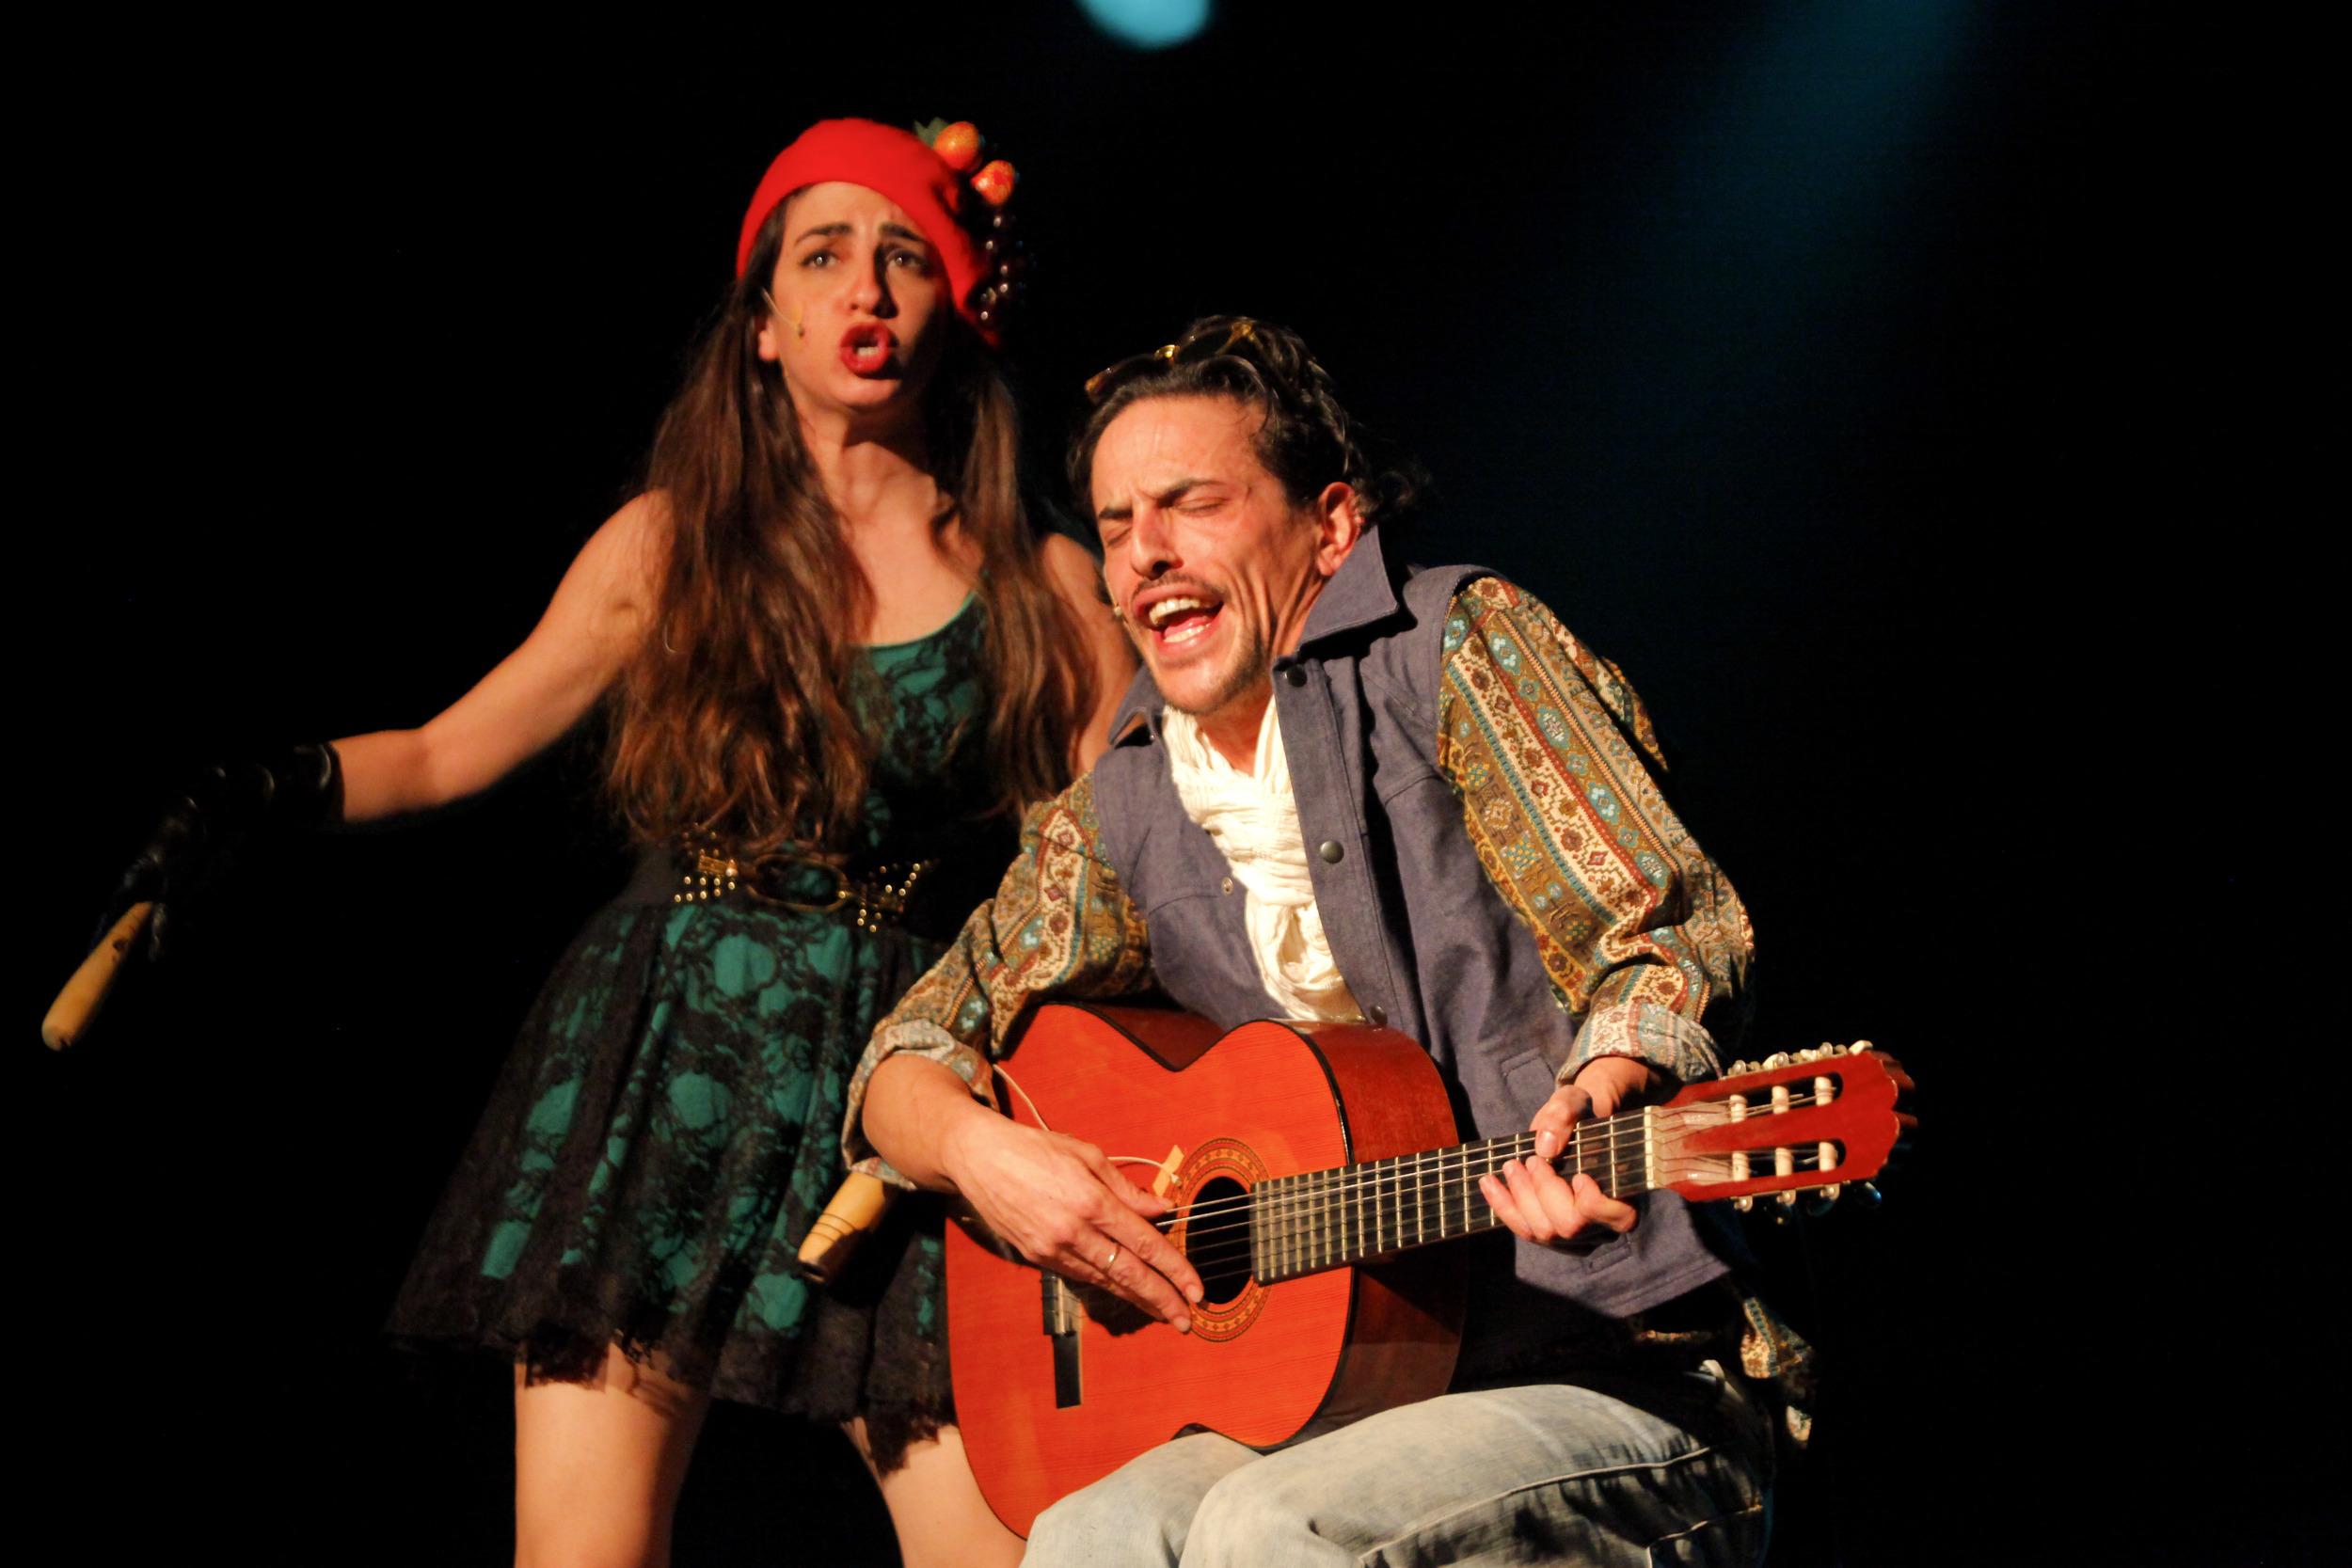 Ben and Dana performing a hilarious sketch in the English version of Tziporela